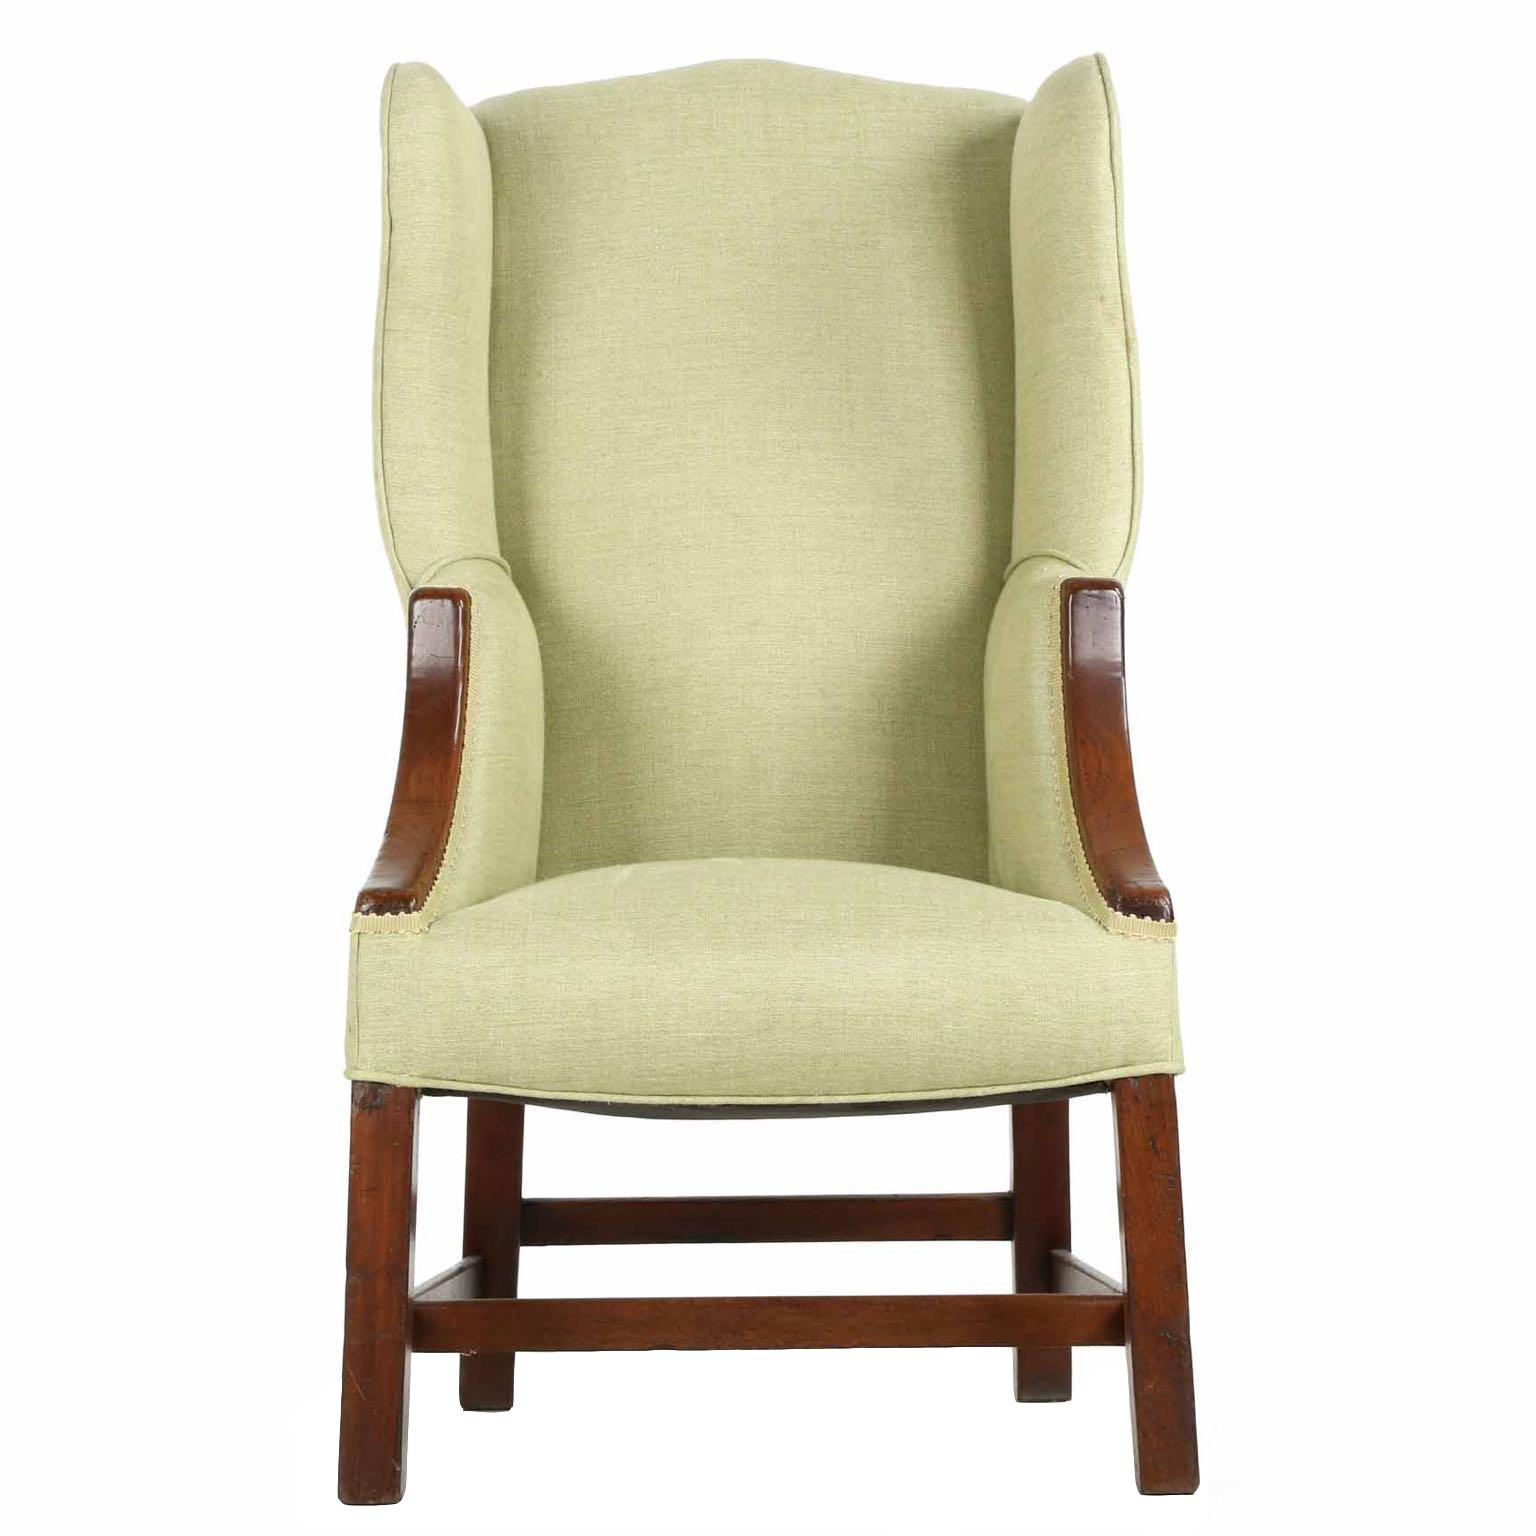 19th century antique english george iii diminutive wingback arm chair